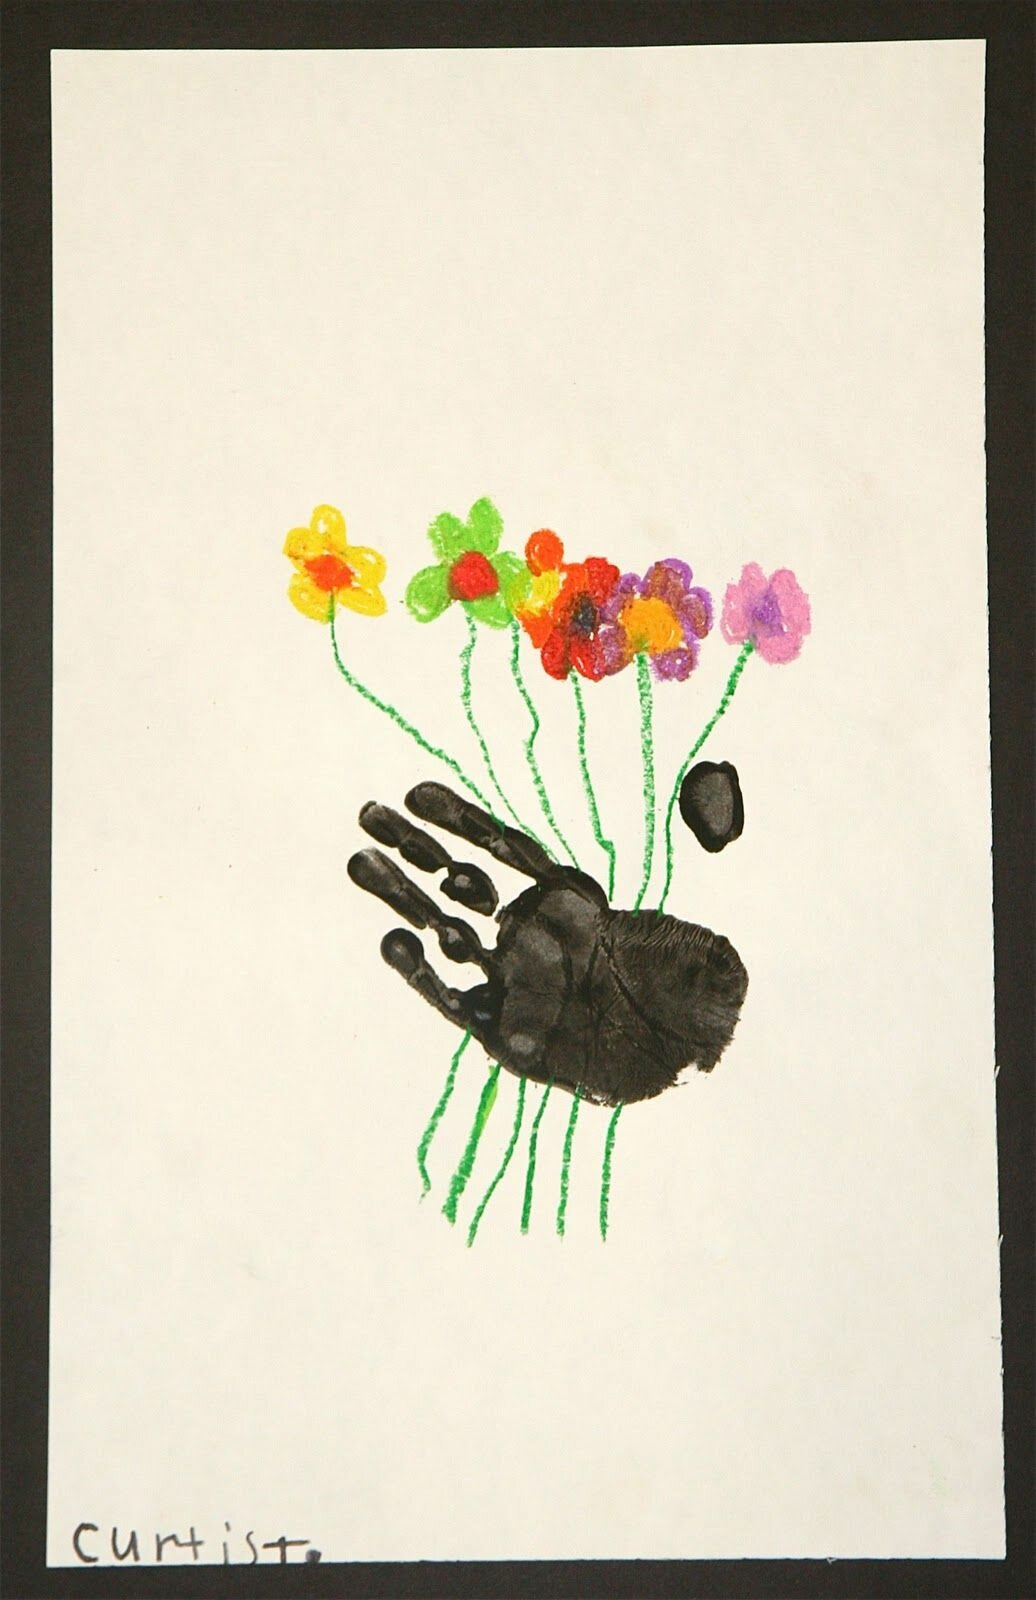 Отпечаток ладони открытка, картинки фотки надписями